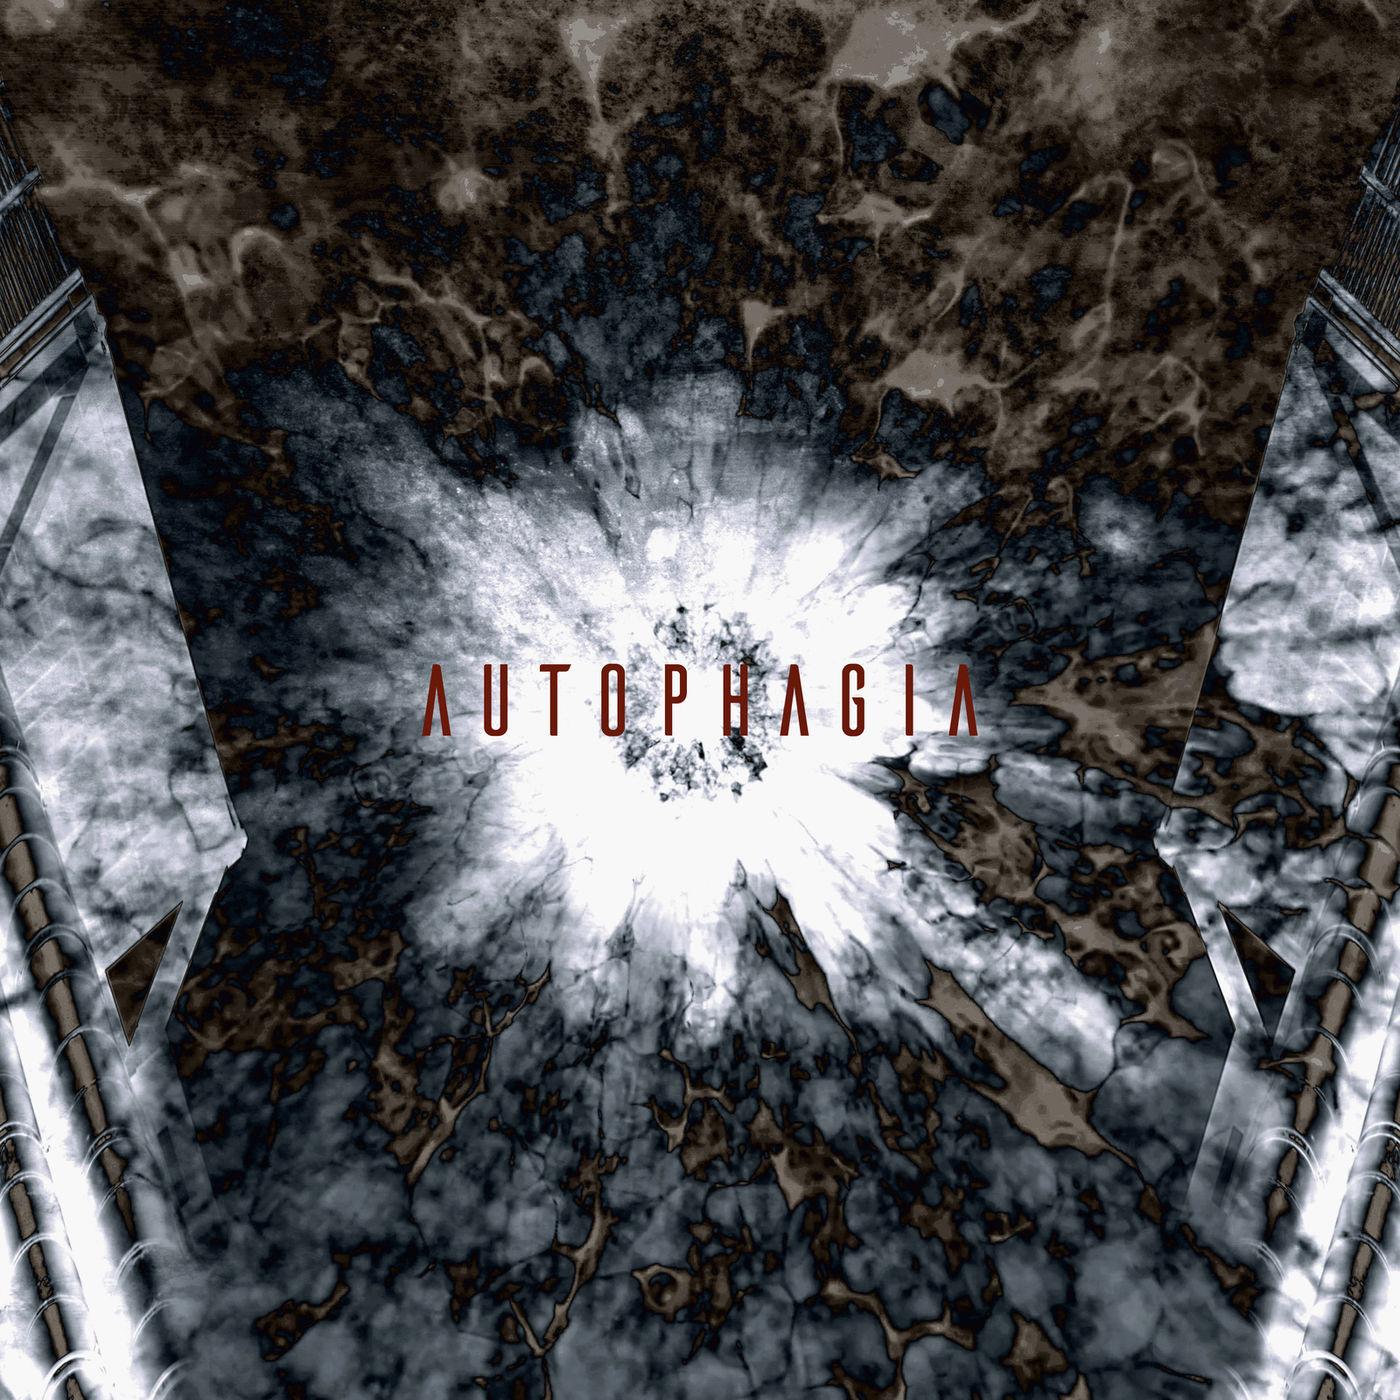 Inferum - Autophagia (feat. CJ McMahon) [Single] (2018)